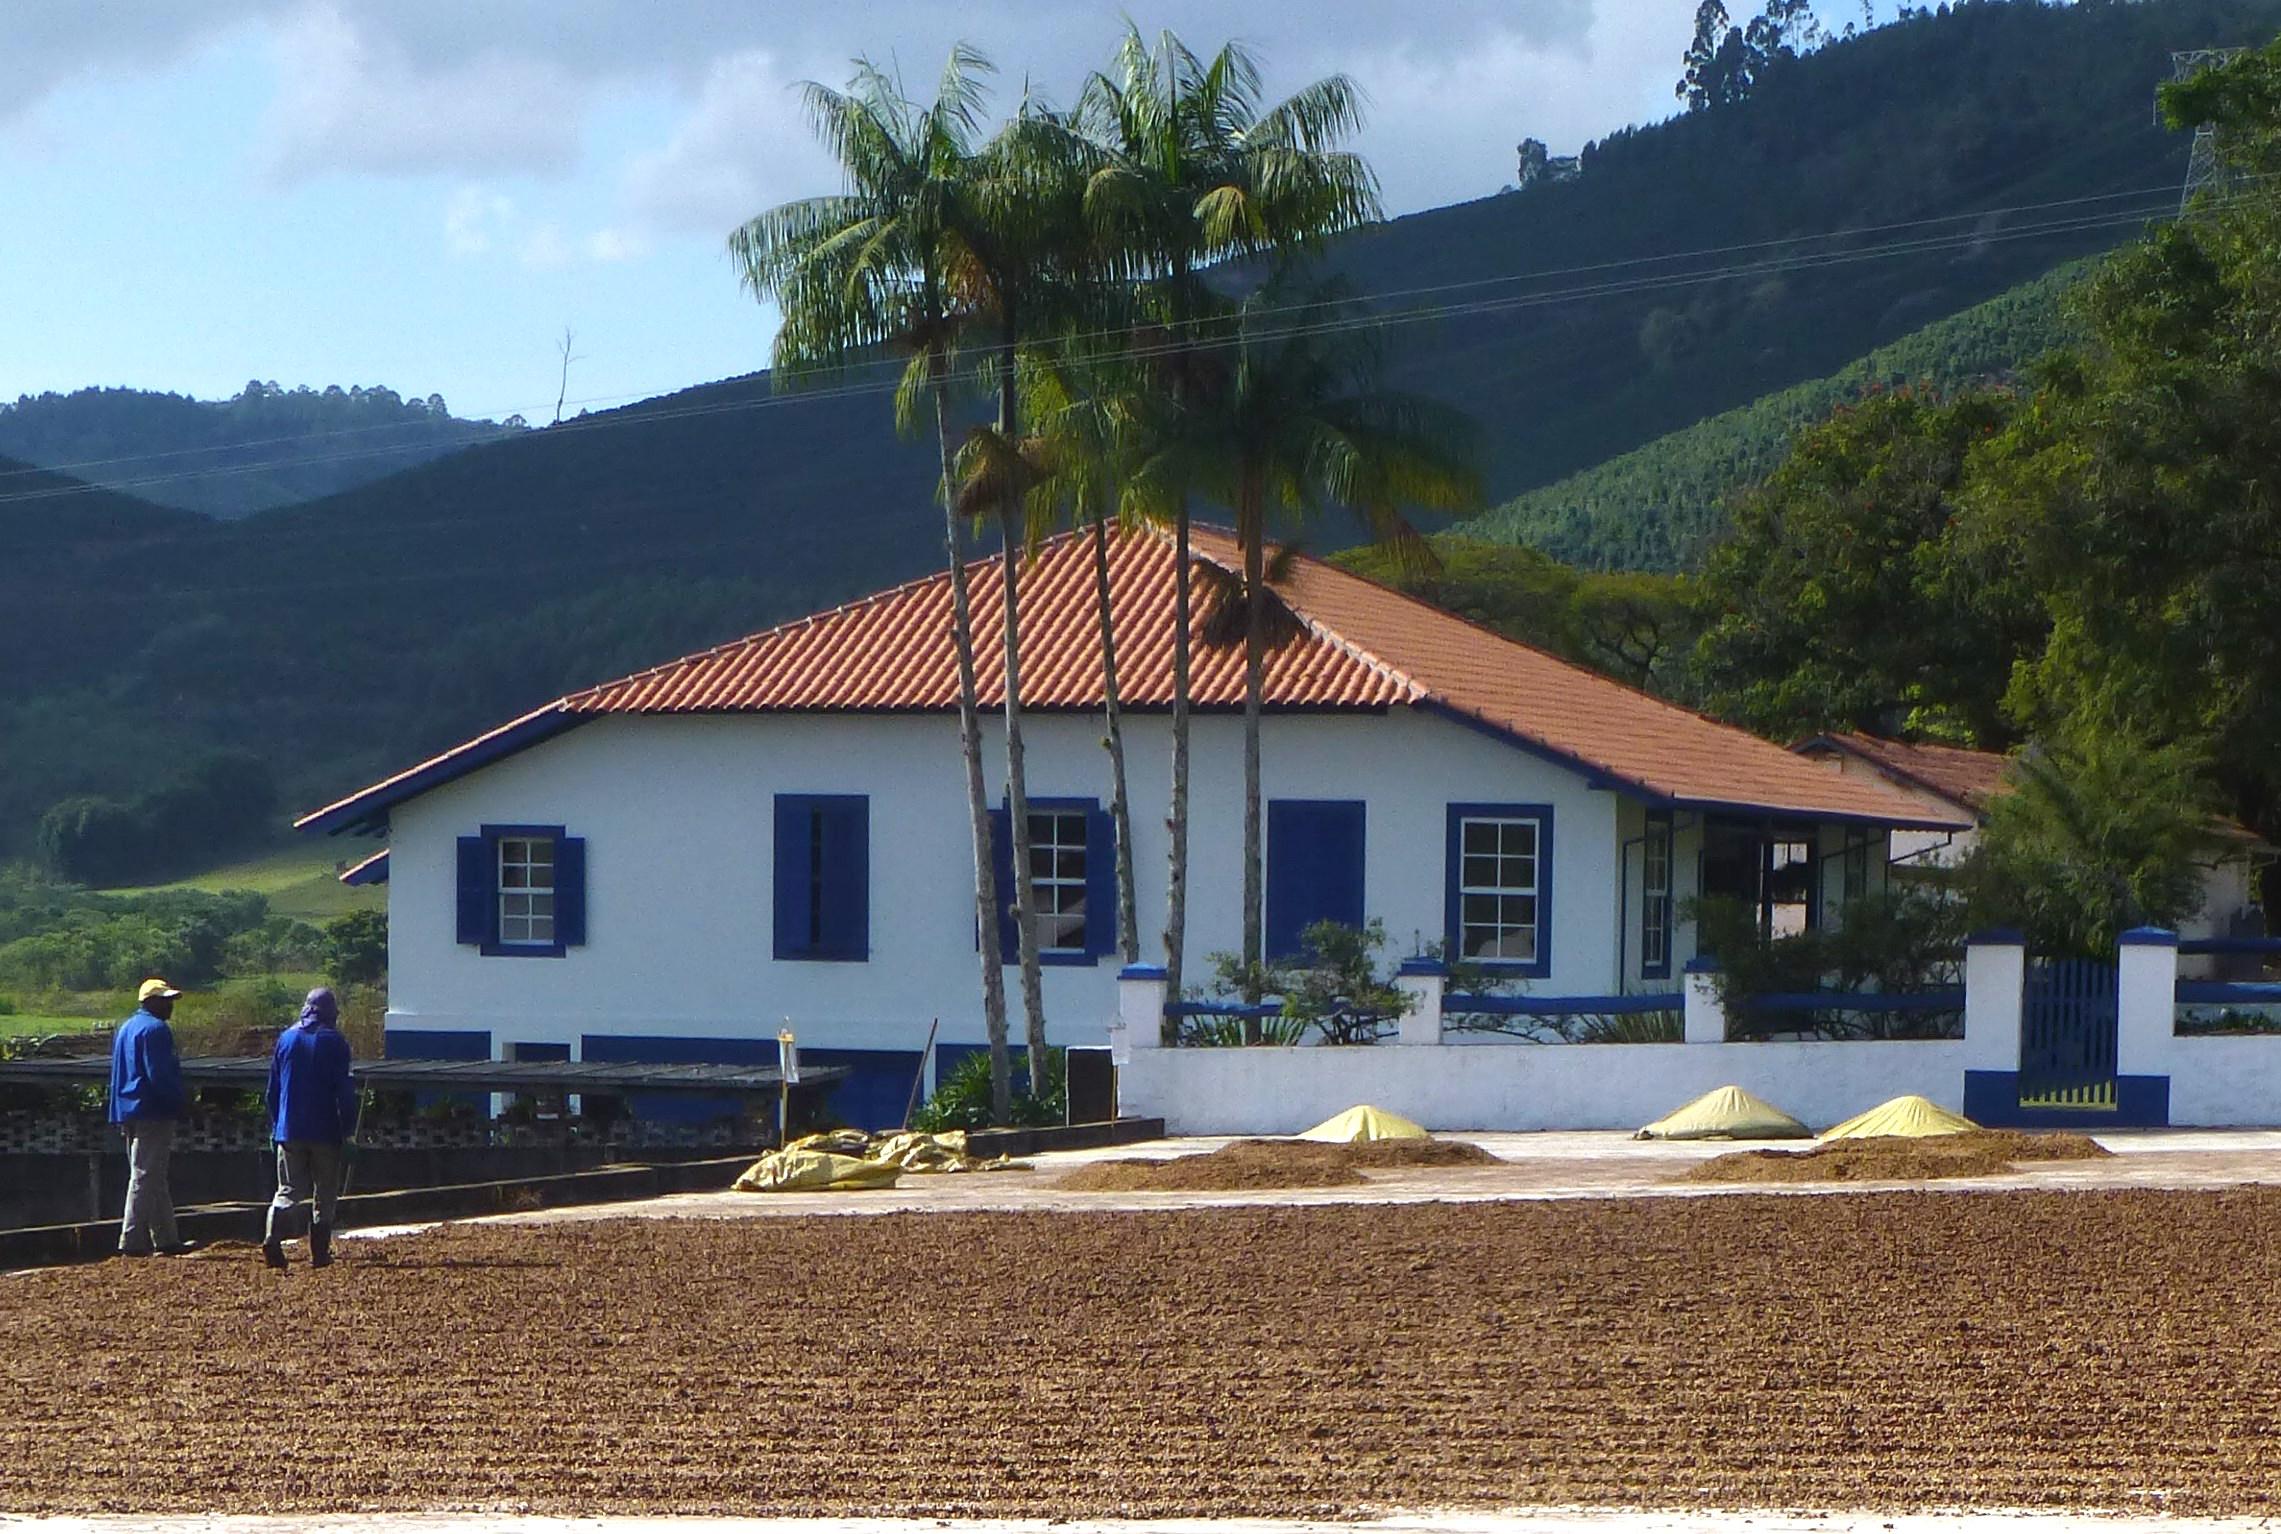 The beautiful Fazenda Recreio, one of our family's farms in Brazil.